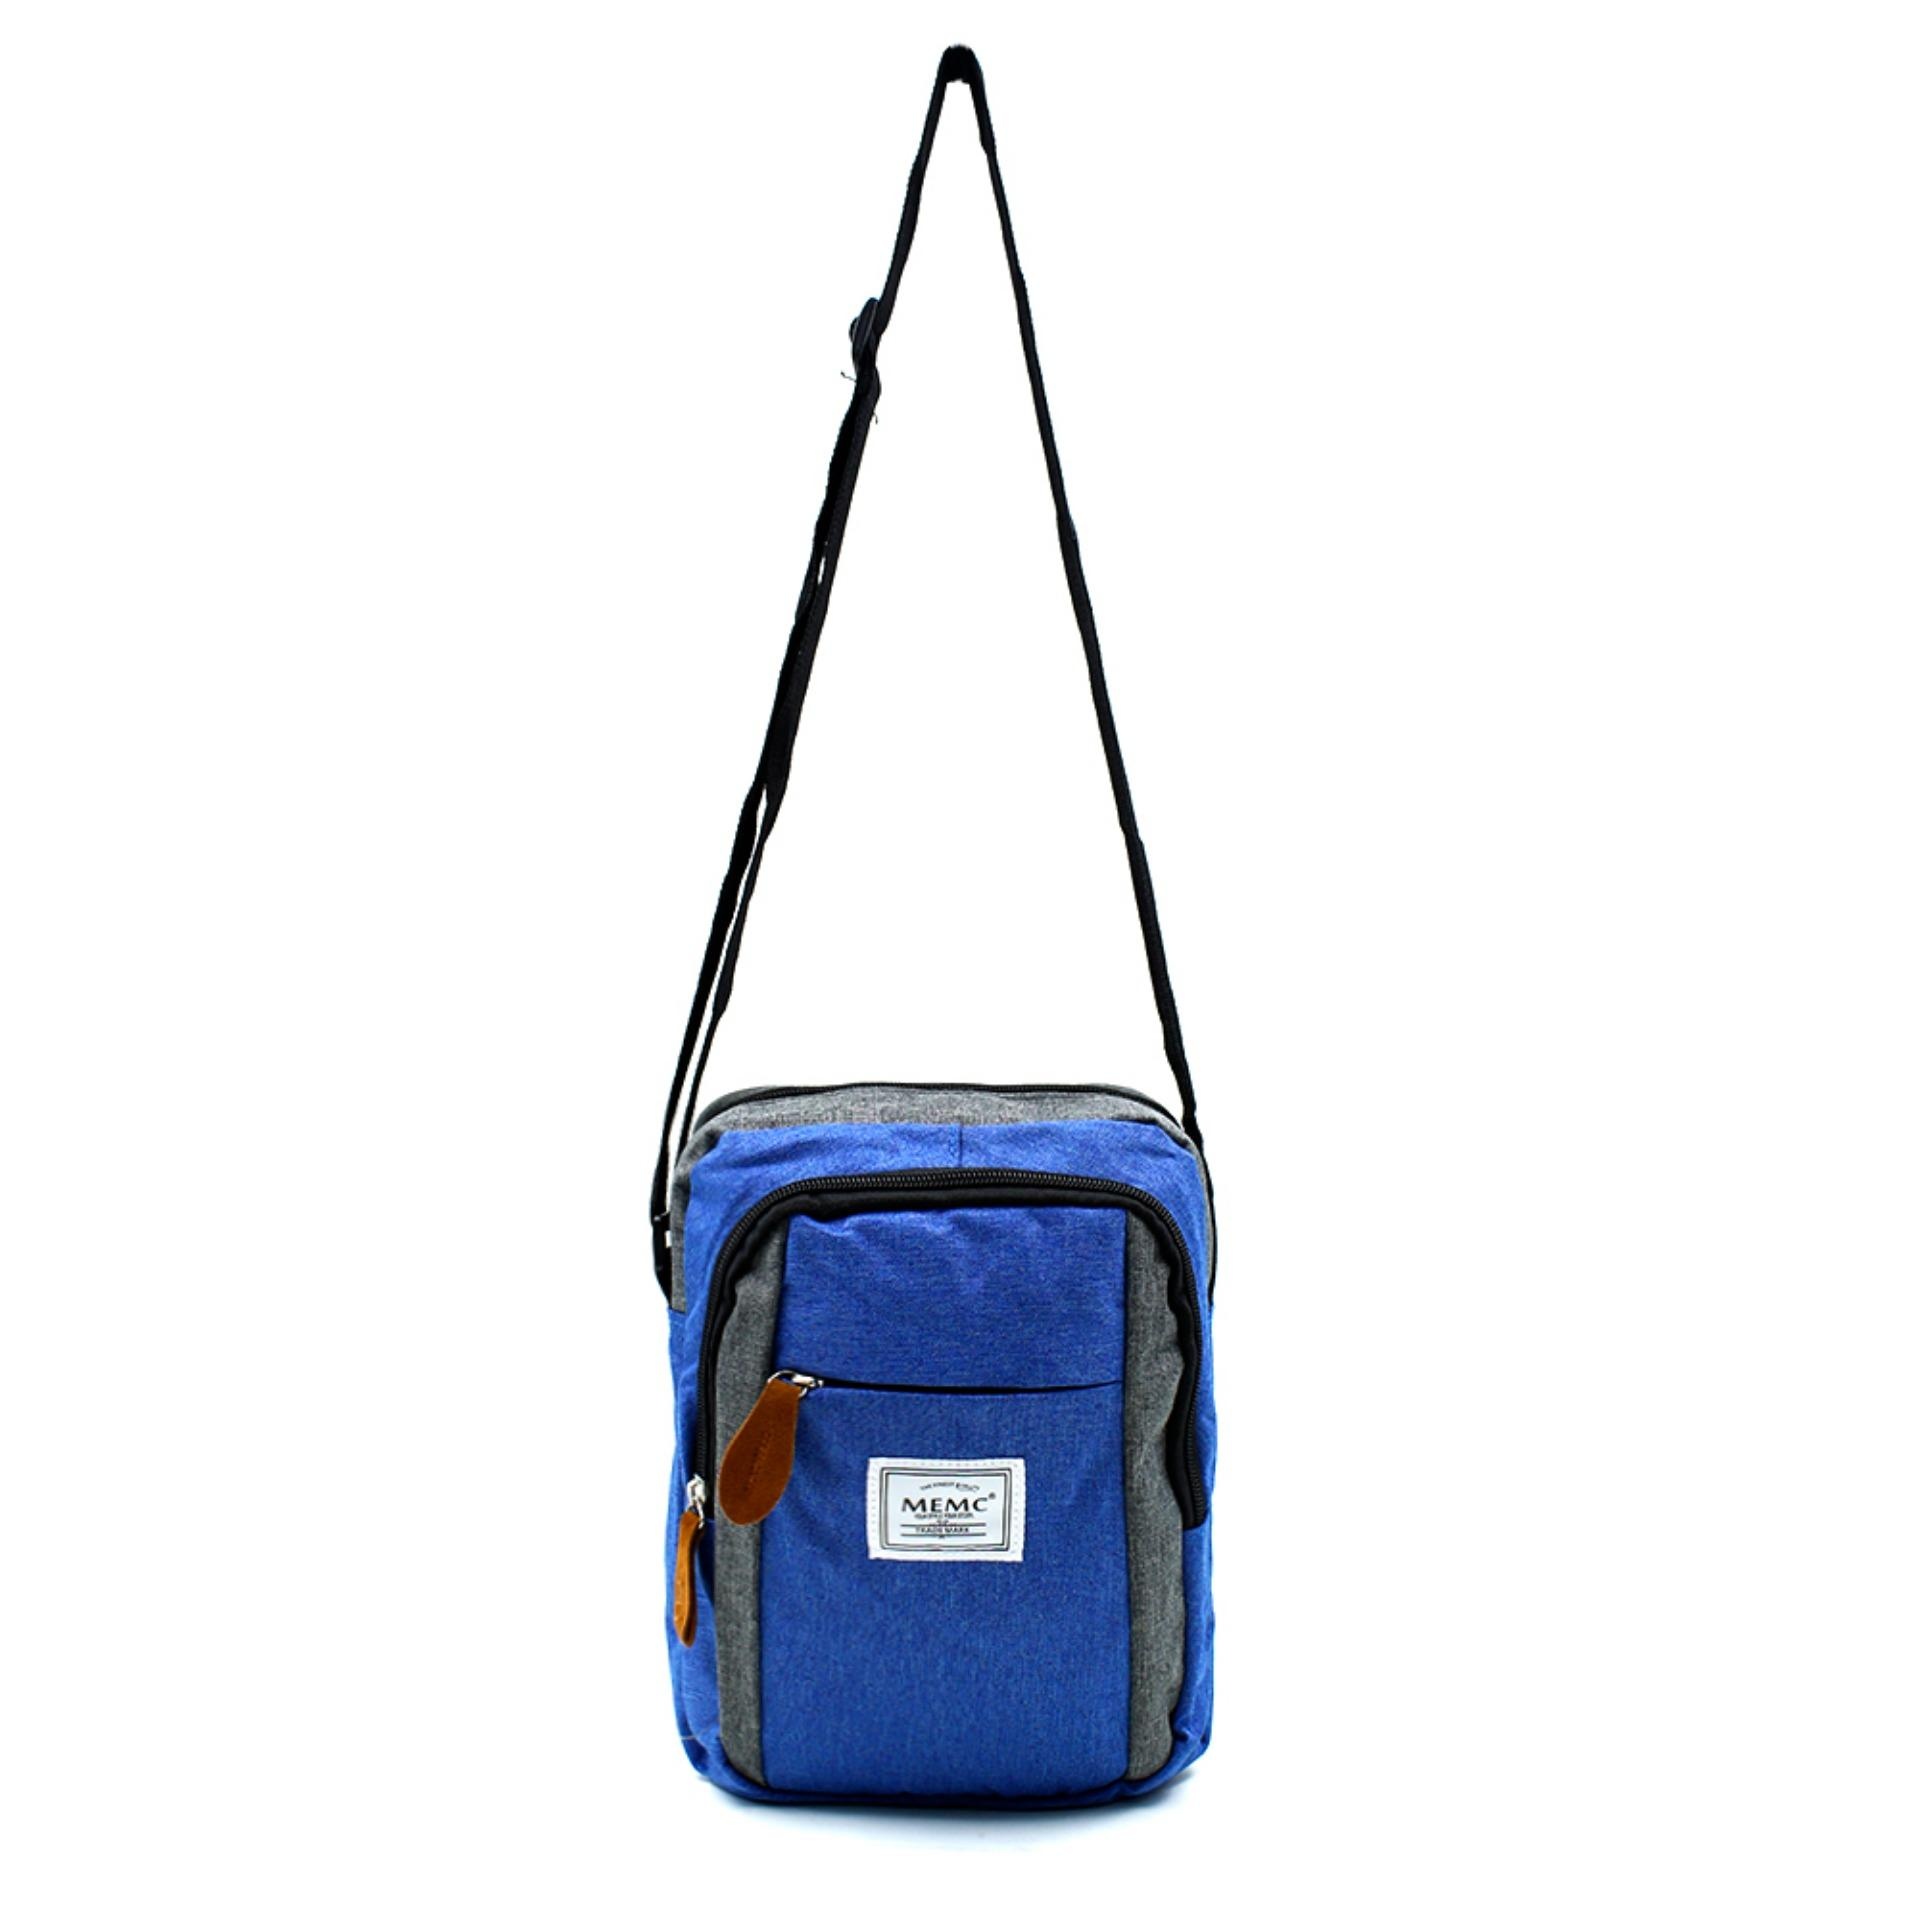 Attraxion Gideon - 1217-1 Sling Crossbody Bag for Men Gray Multicolored (Blue)